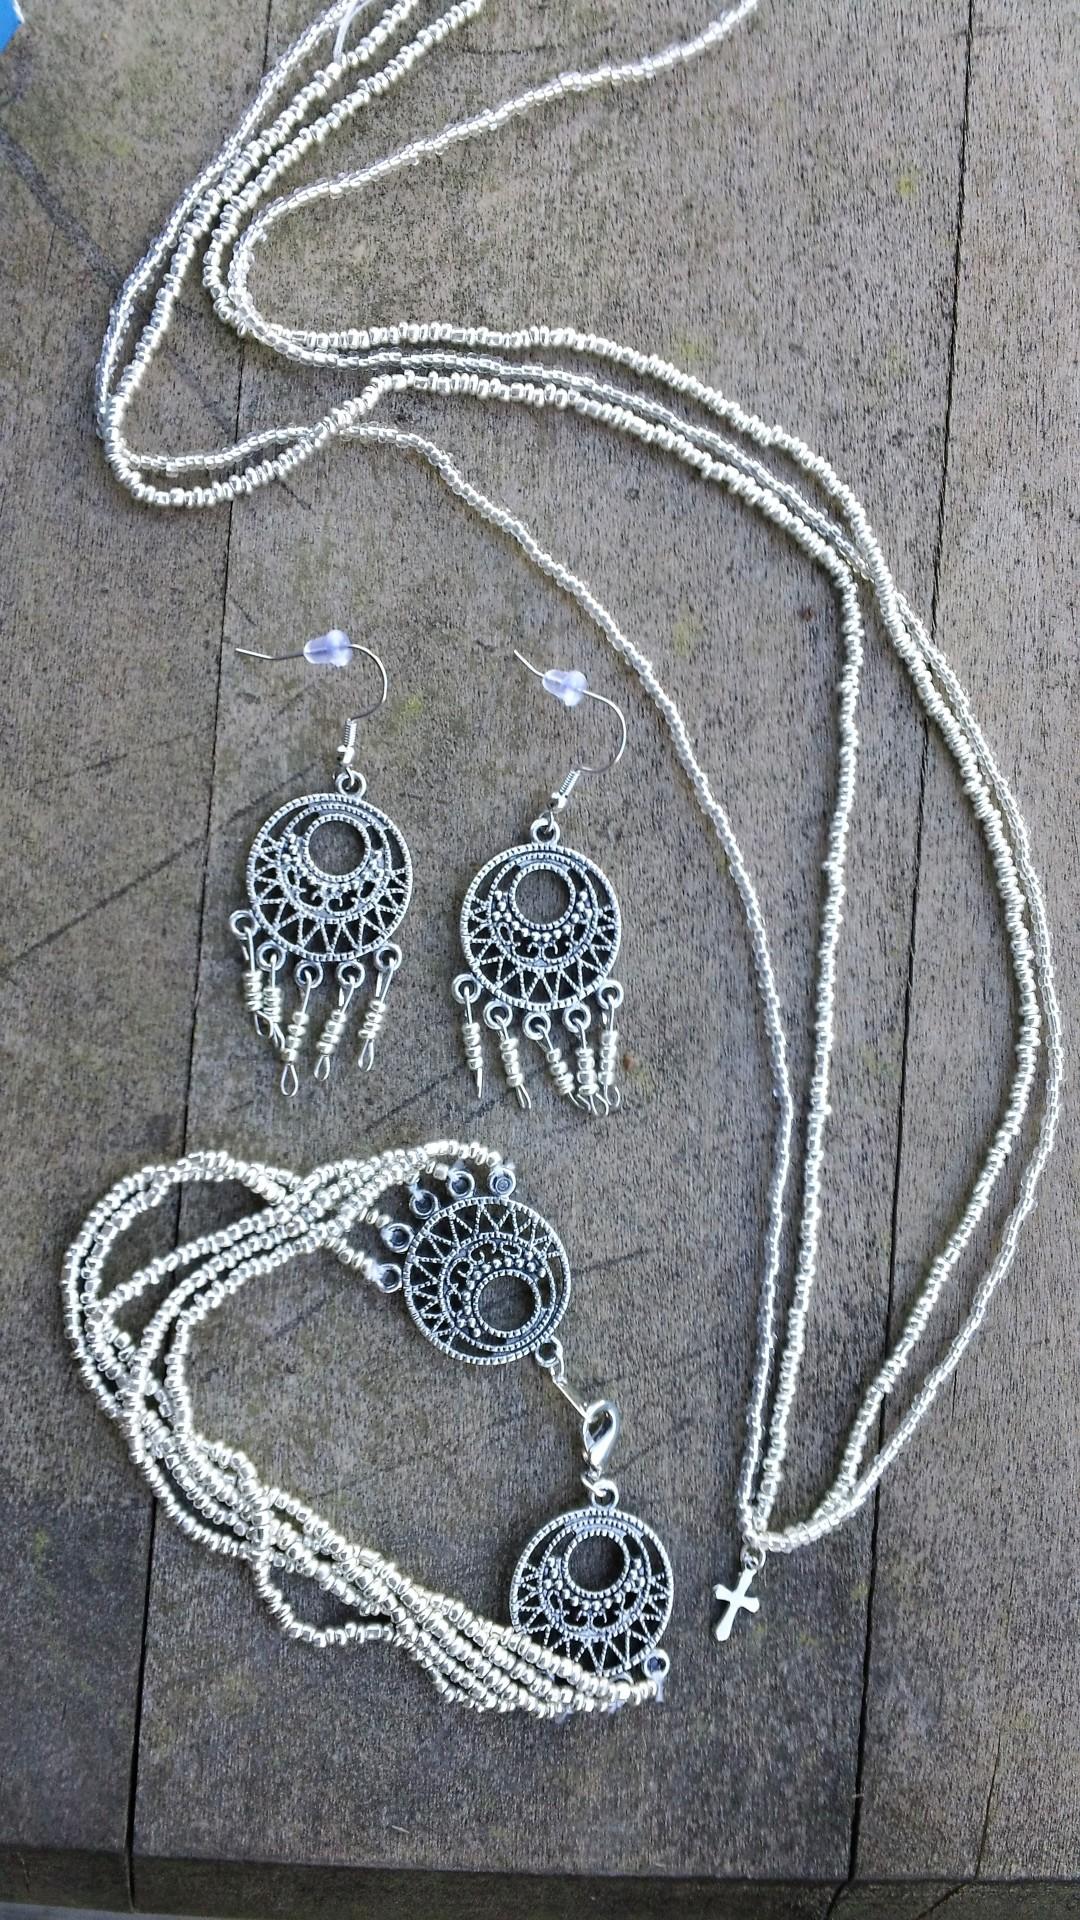 Handmade Necklace, Earrings & Bracelet -  Current Bid $22.00